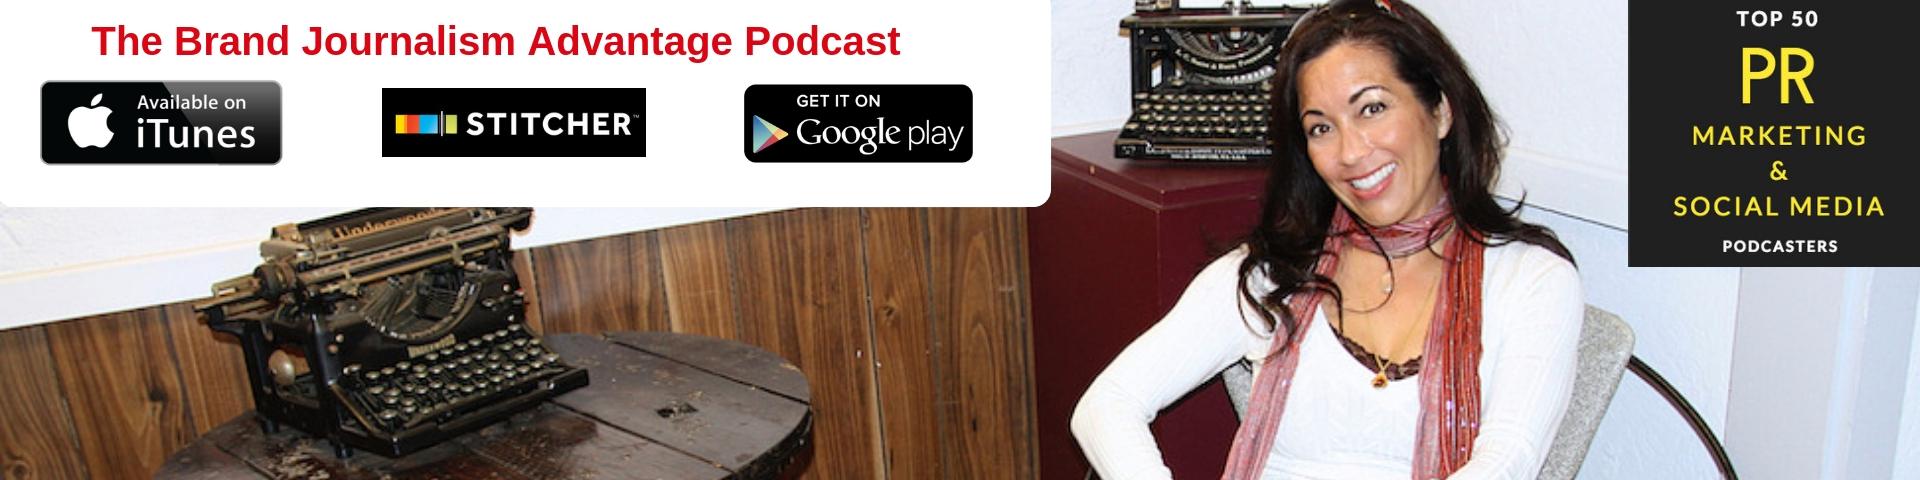 The Brand Journalism Advantage Podcast archive   PHOEBE